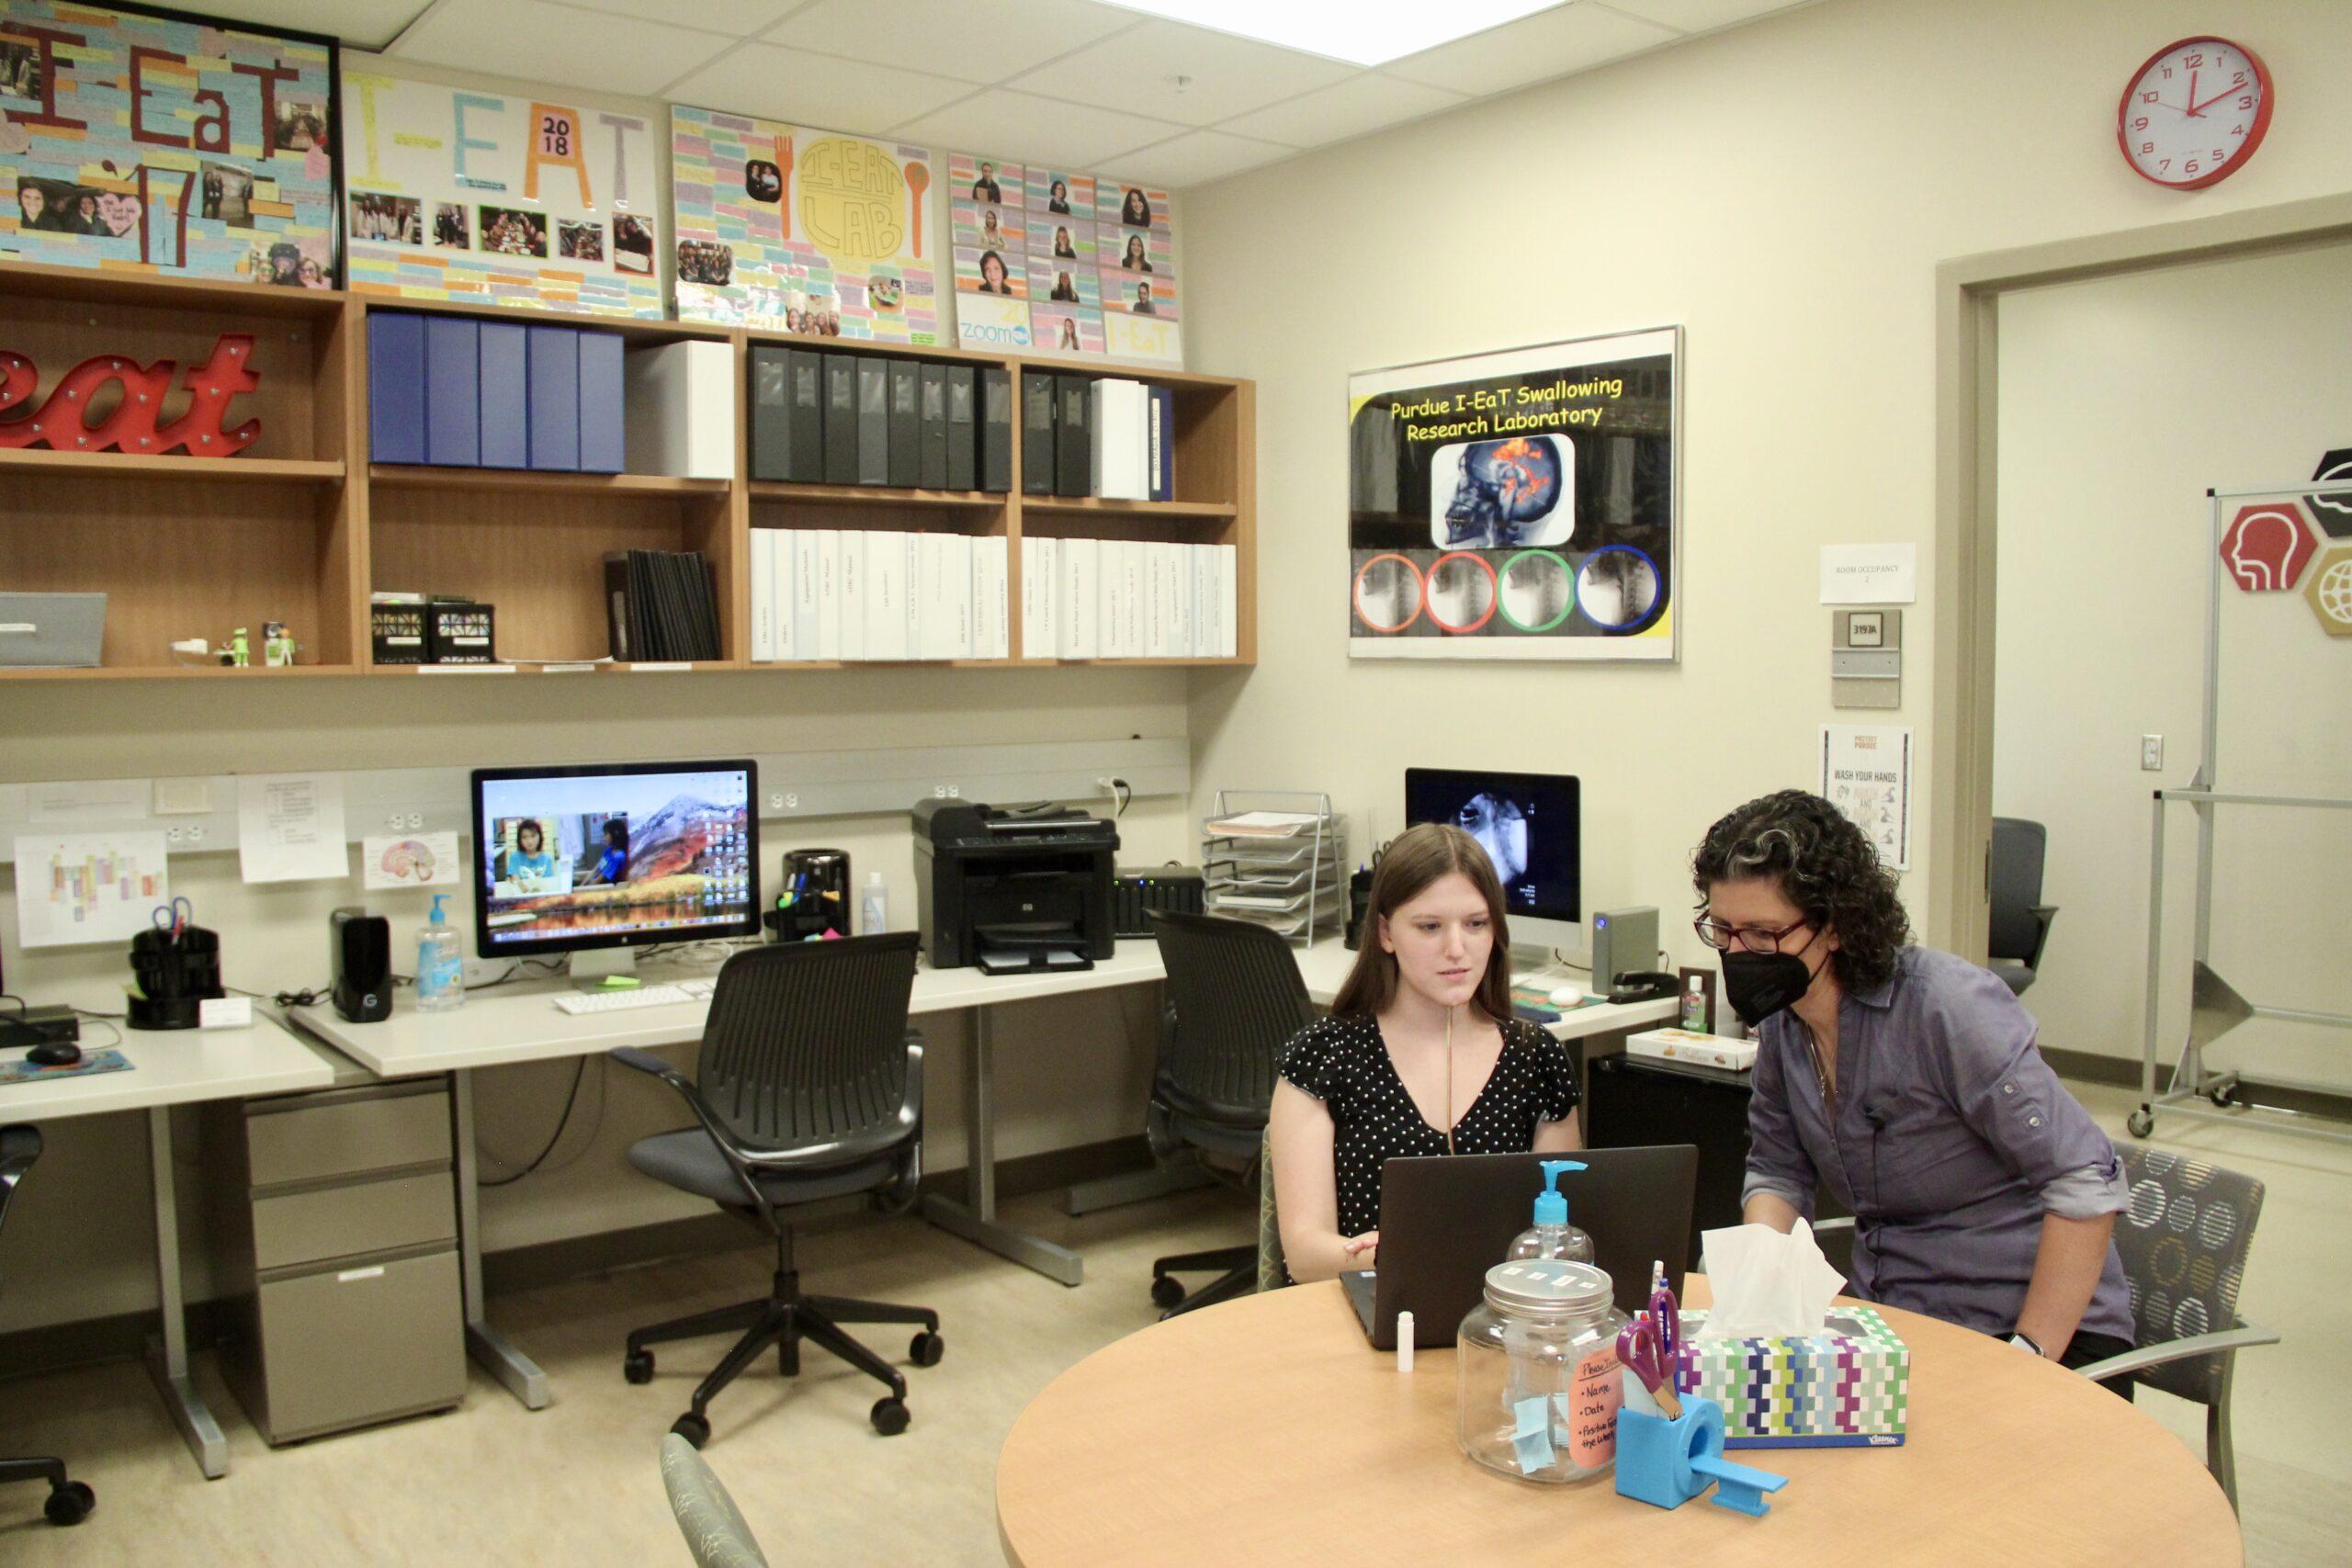 Georgia Malandraki and graduate student Jennine Bryan work in the I-EaT Lab.